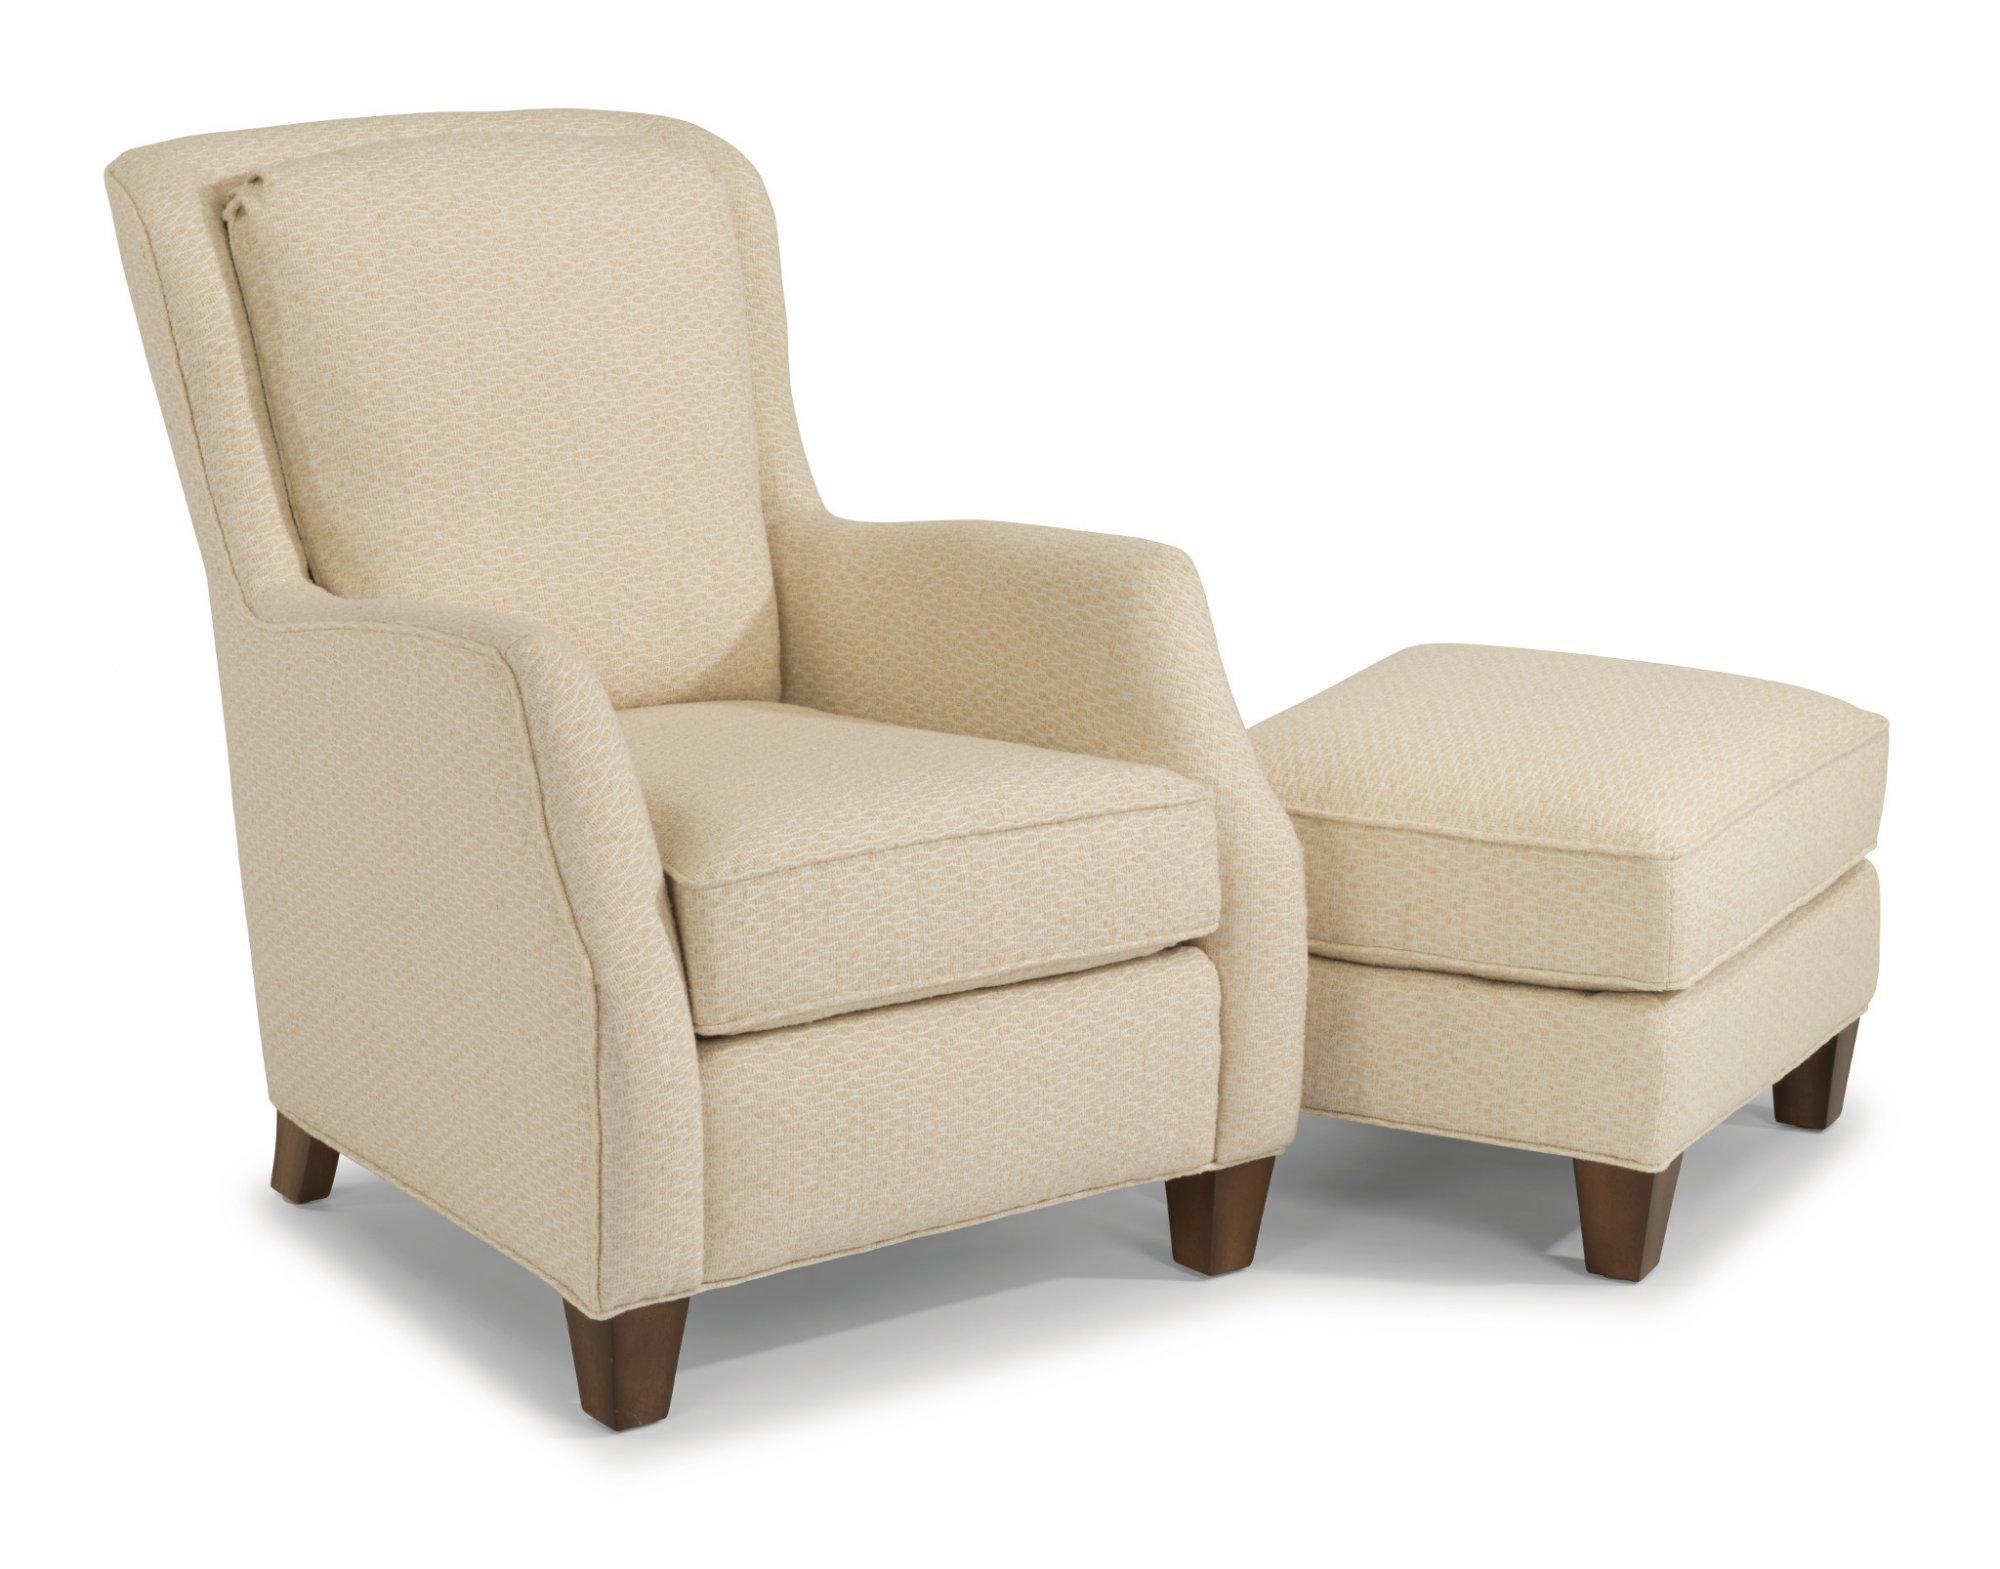 Model: 0124-10   Flexsteel Allison  Fabric Chair